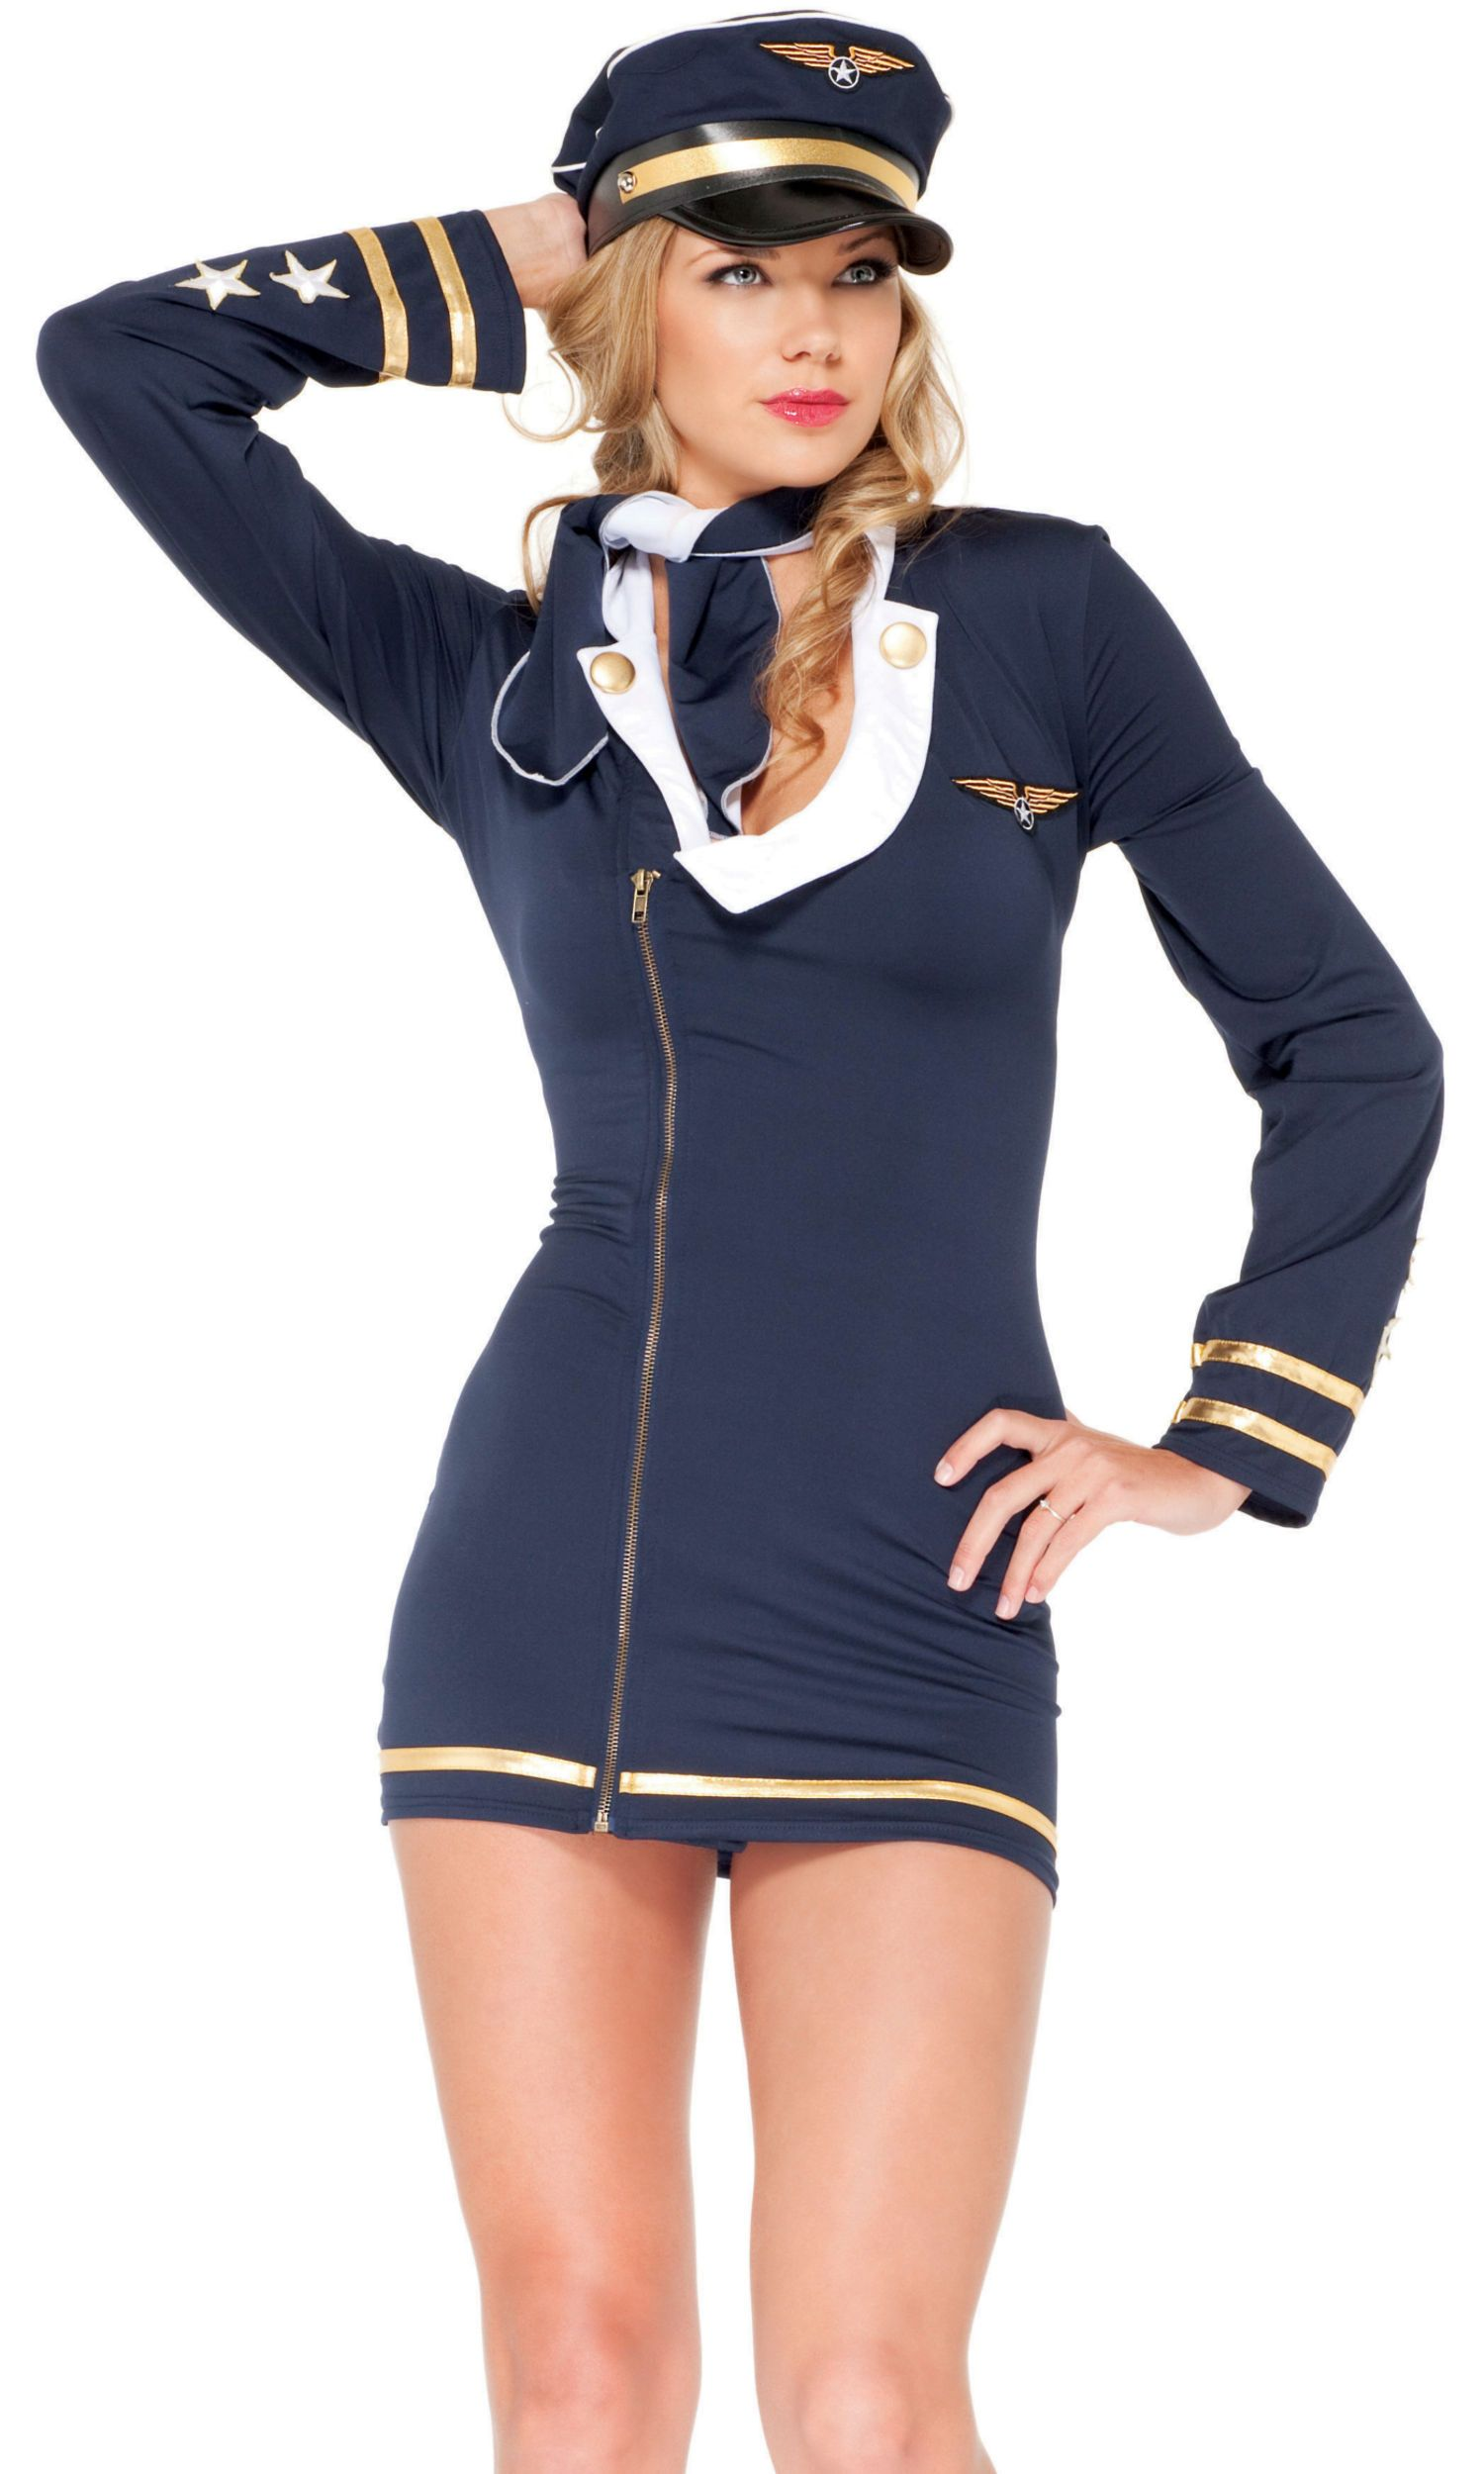 Sexy pilot halloween costume